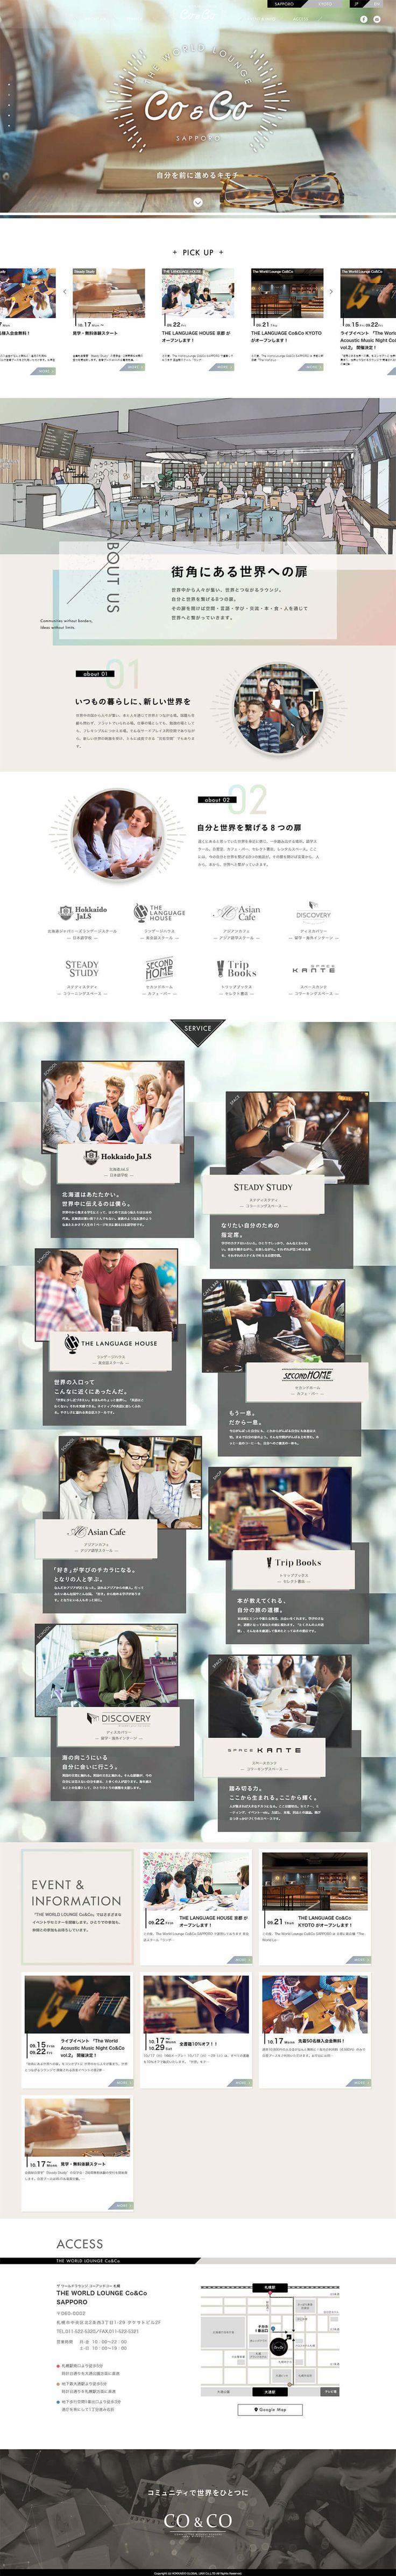 THE WORLD LOUNGE Co&Co SAPPORO様の「THE WORLD LOUNGE Co&Co SAPPORO」のランディングページ(LP)シンプル系|サービス・保険・金融 #LP #ランディングページ #ランペ #THE WORLD LOUNGE Co&Co SAPPORO